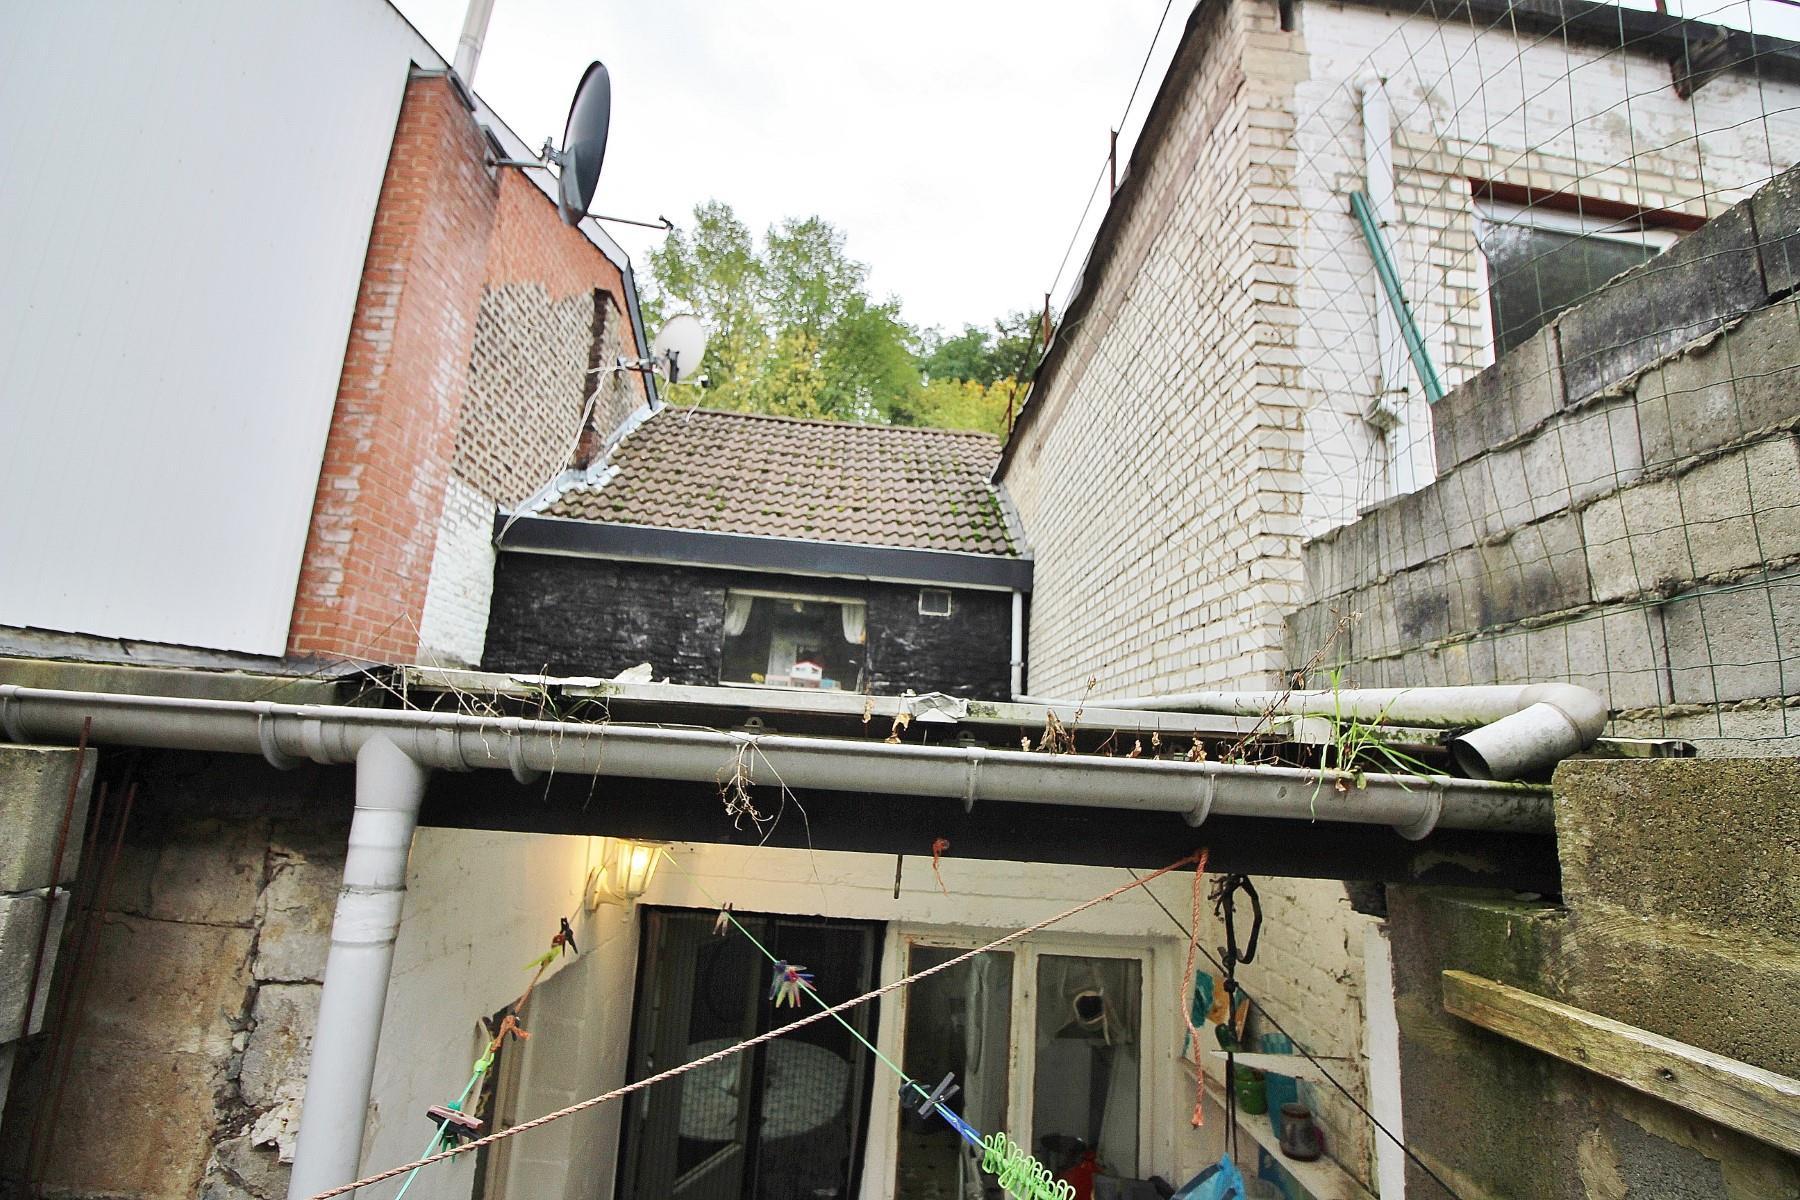 Maison - Seraing Jemeppesur-Meuse - #3879549-21